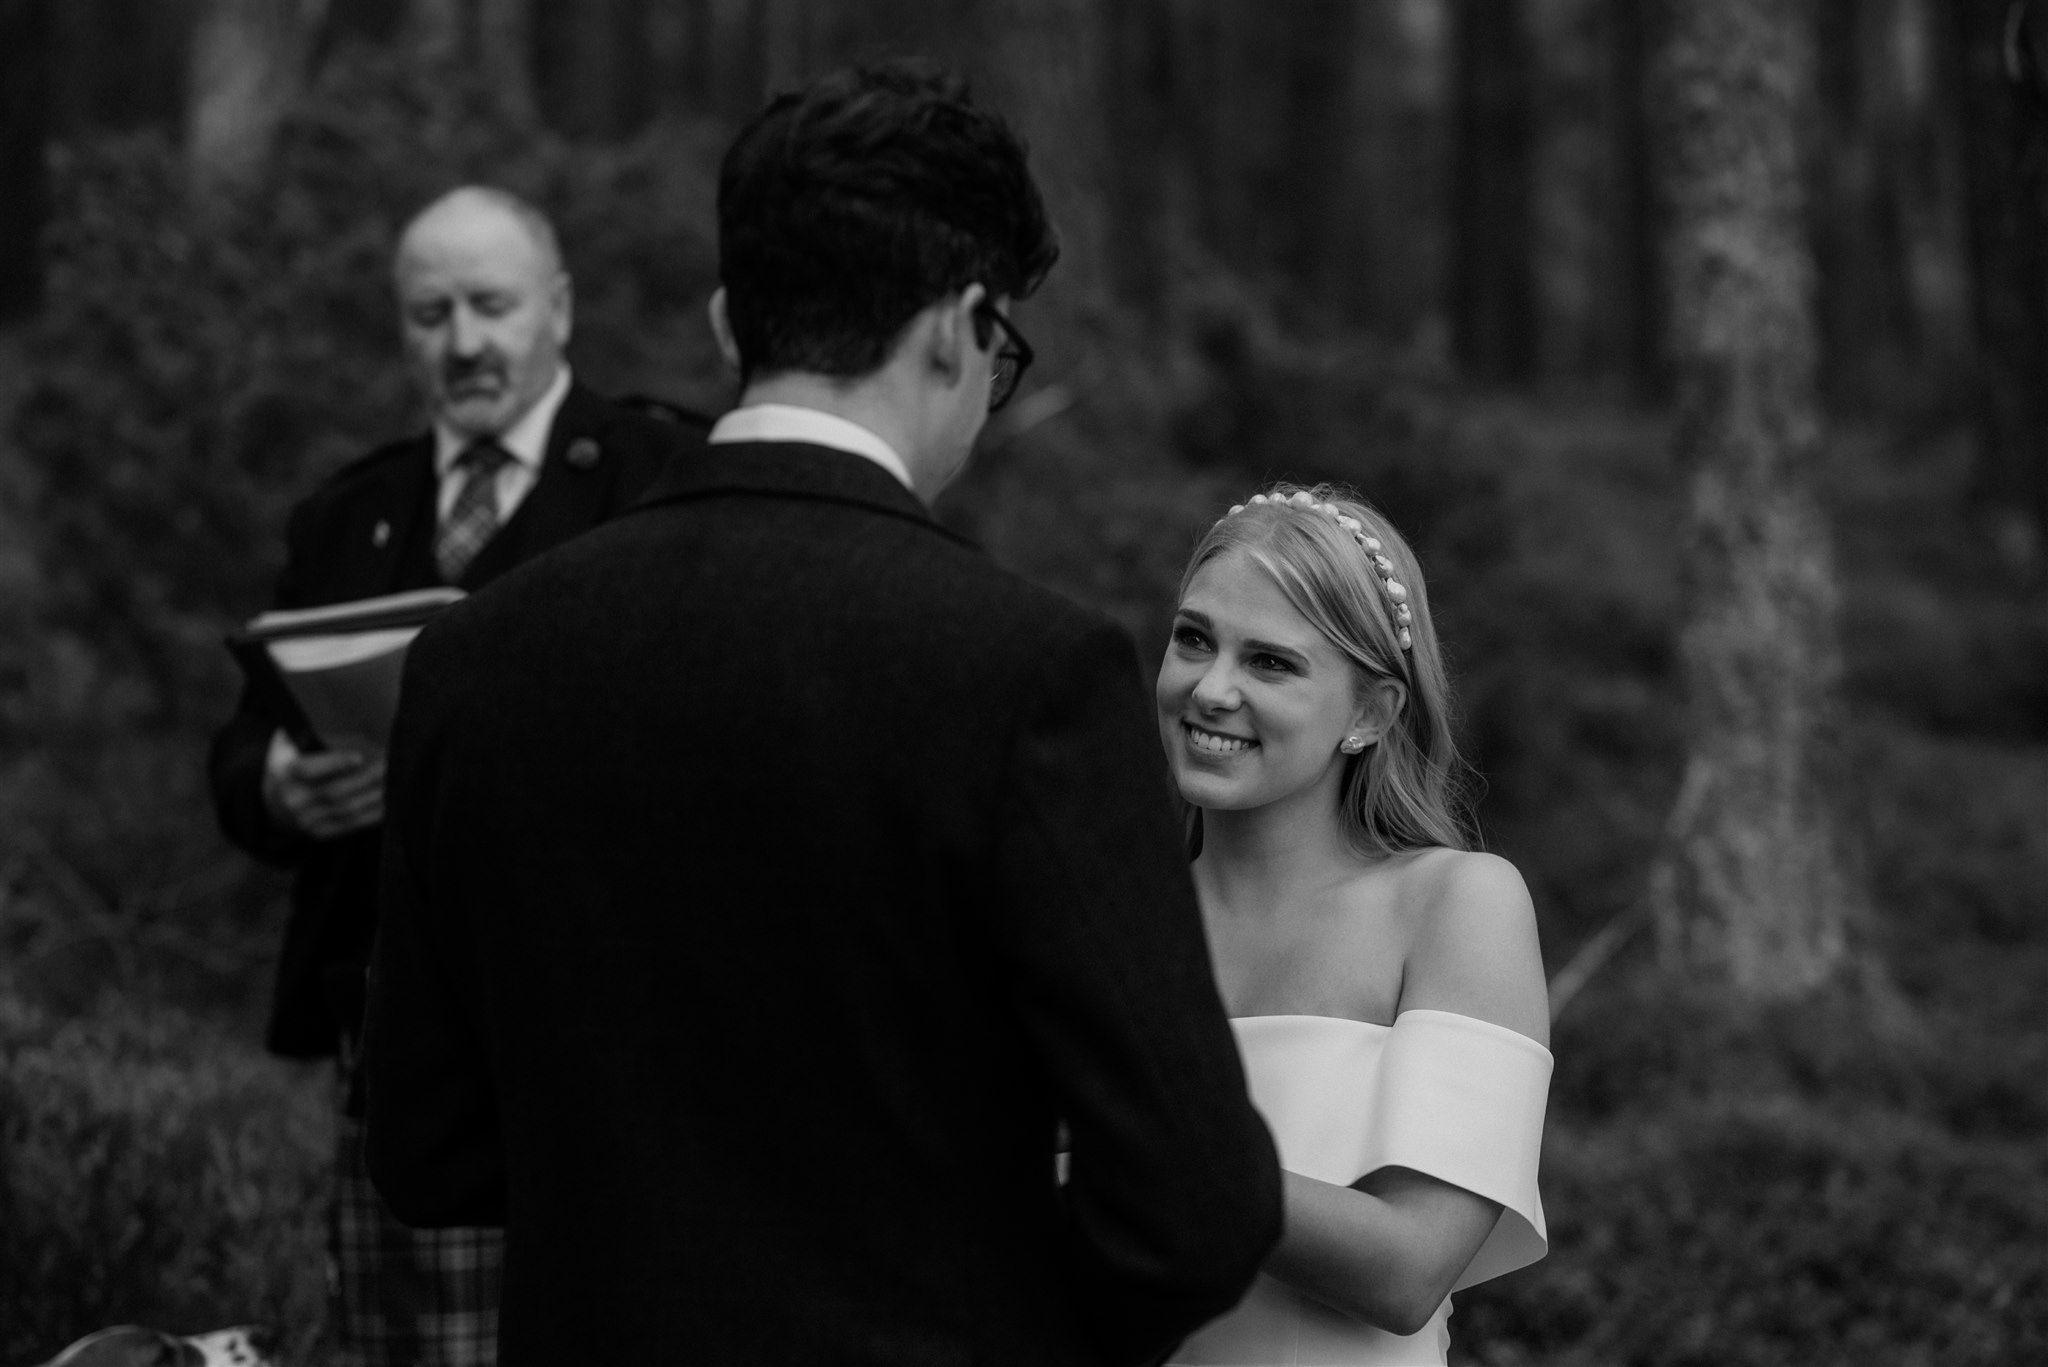 Bride at a Loch Garten elopement ceremony in the Cairngorms